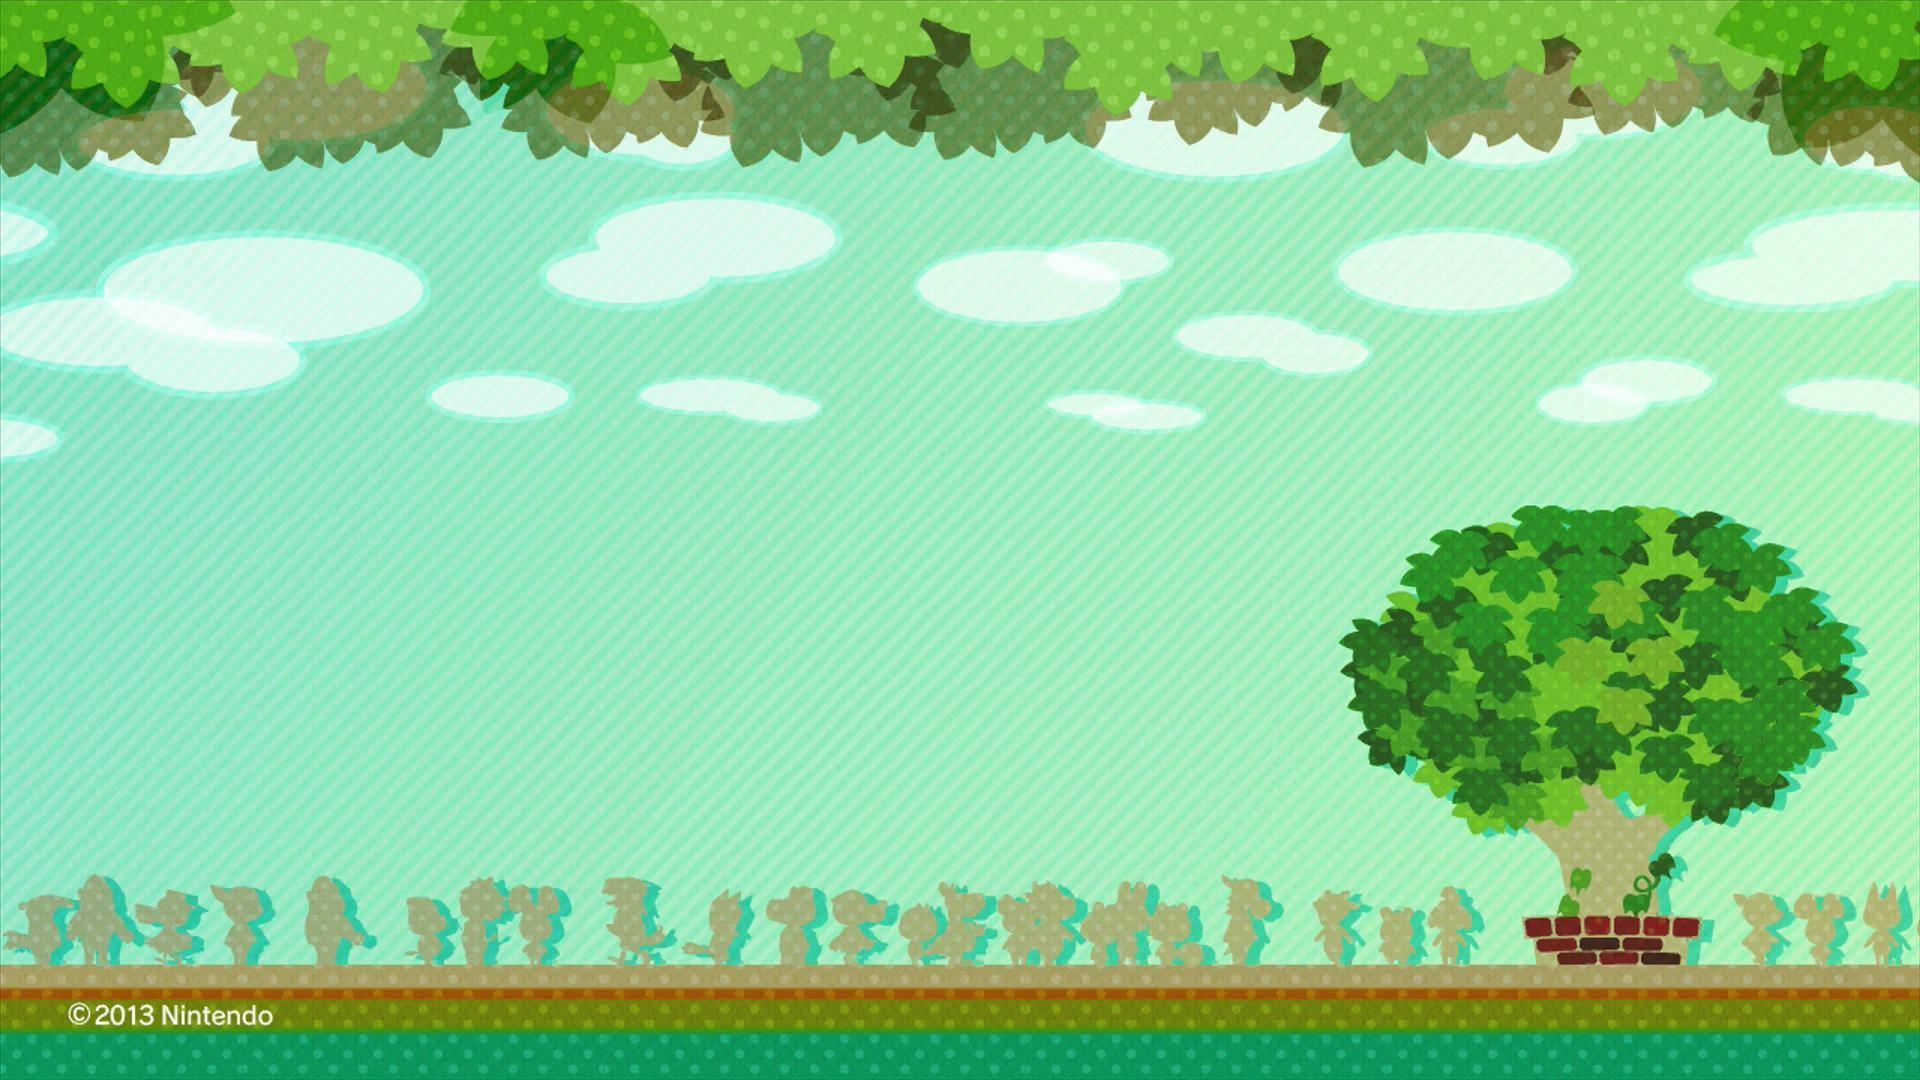 Animal Crossing Images   Data-src - Animal Crossing Desktop Background - HD Wallpaper